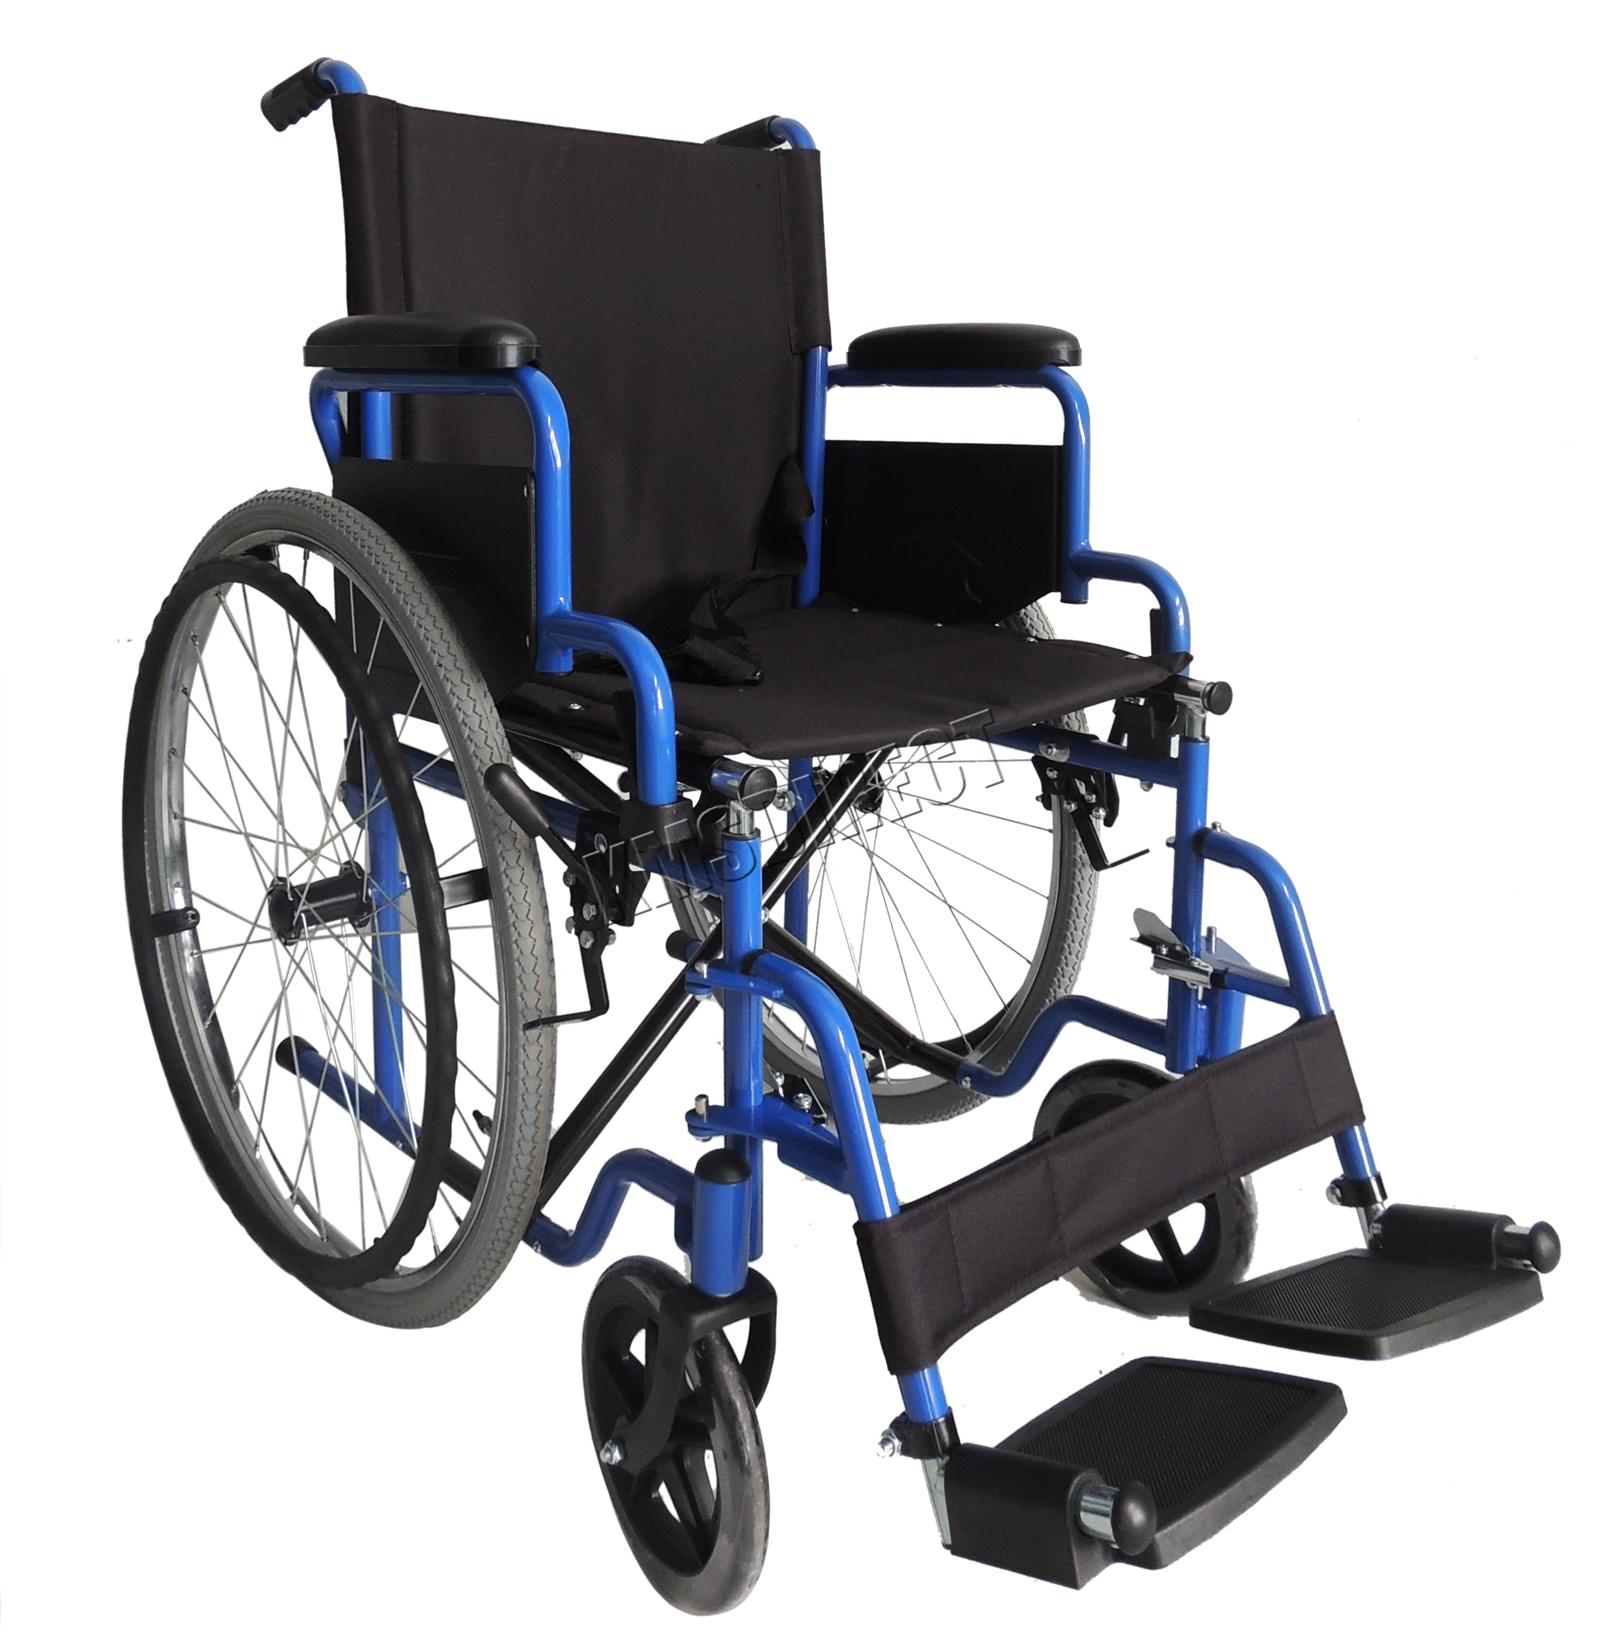 wheelchair manual bedroom chair ebay australia foxhunter blue self propelled folding lightweight transit